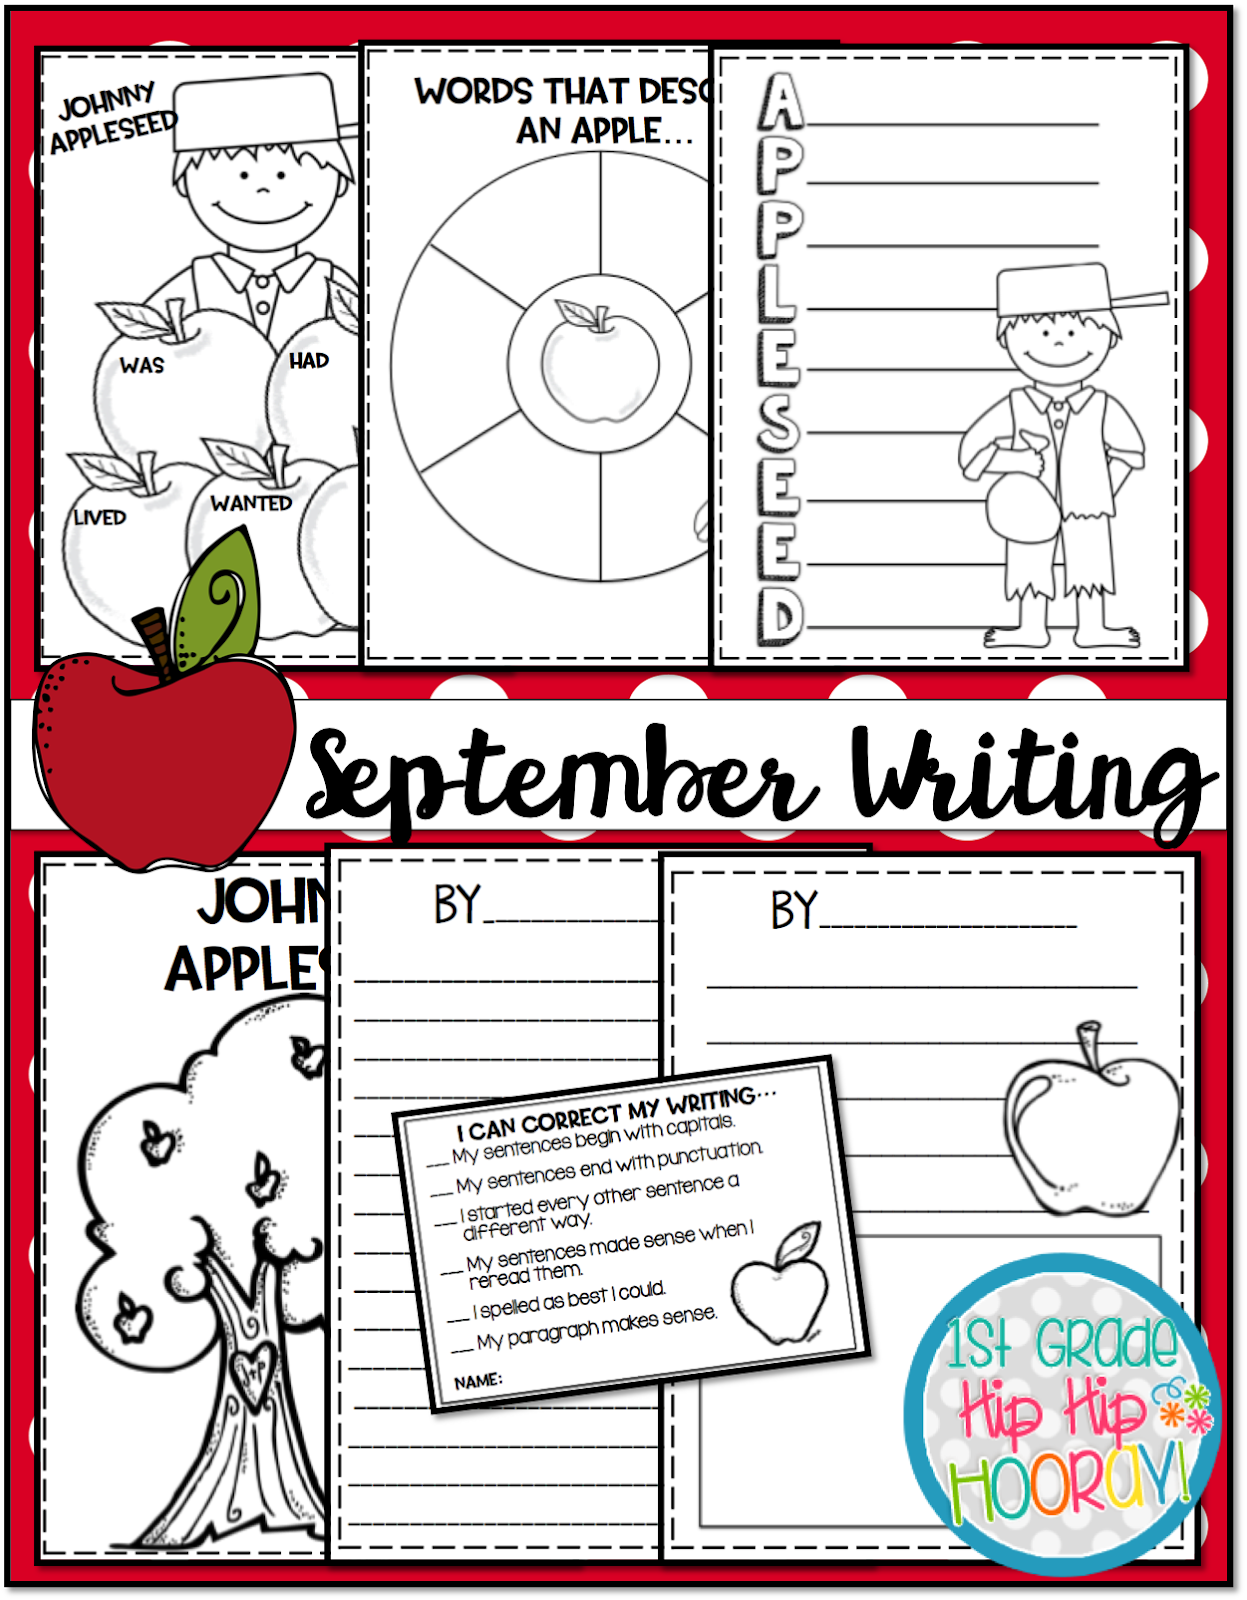 1st Grade Hip Hip Hooray September Johnny Appleseed